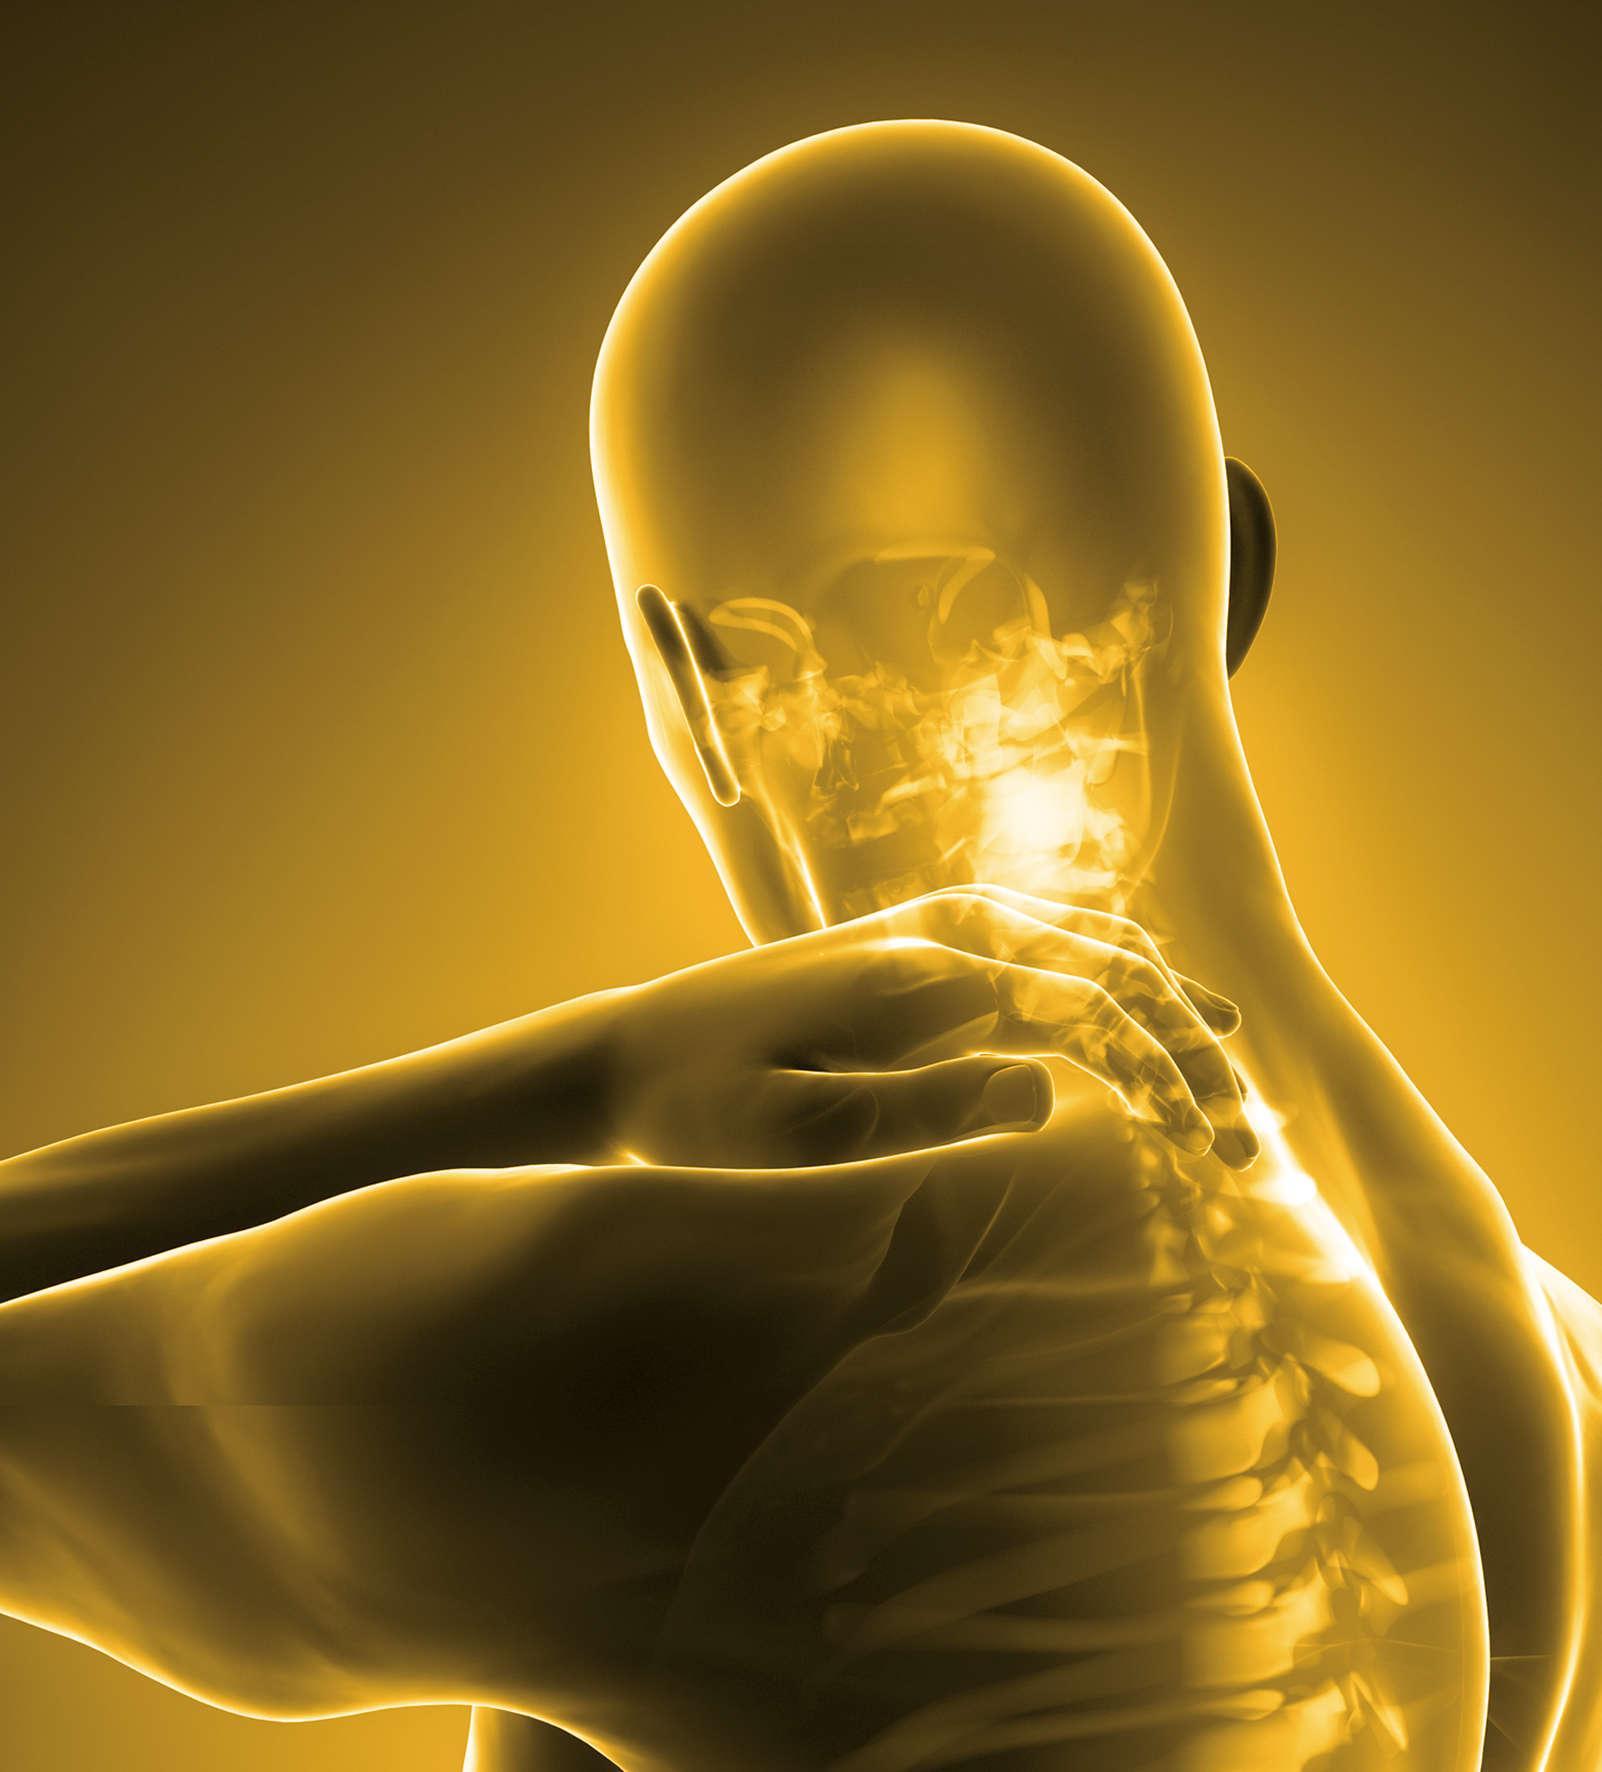 Medicina Riabilitativa e Fisiokinesiterapia